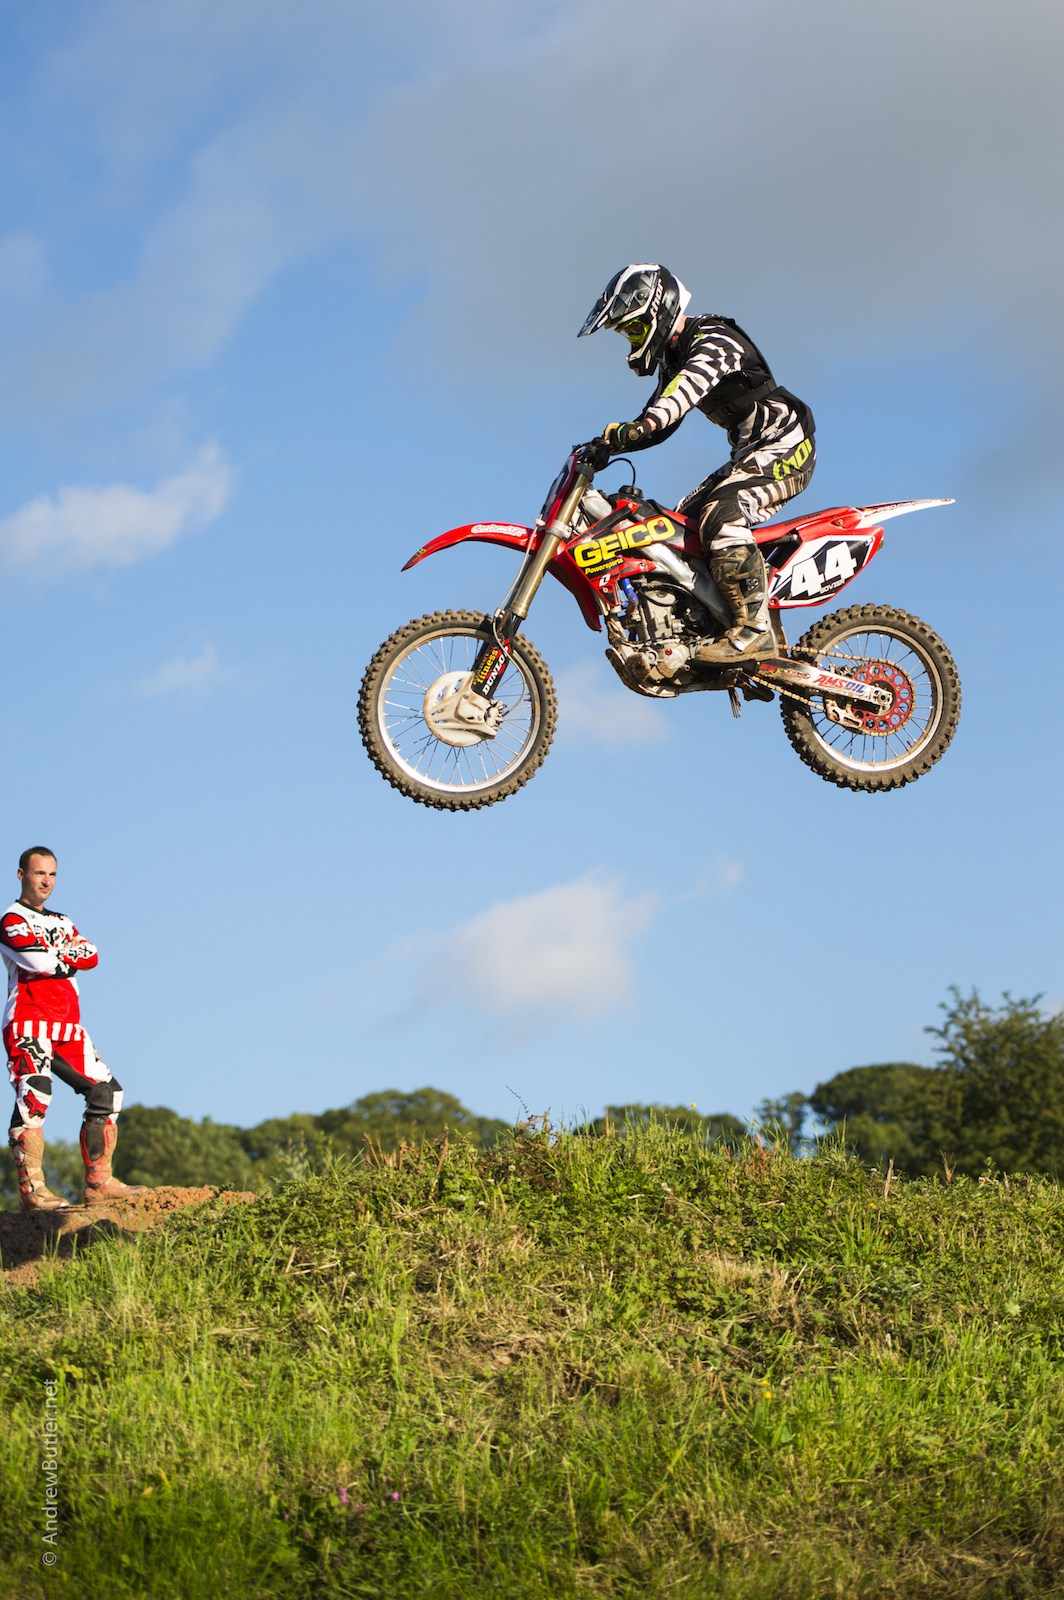 Photo of Motocross Rider Bike Photography Goodwood by Andrew Butler Exeter Photographer Devon